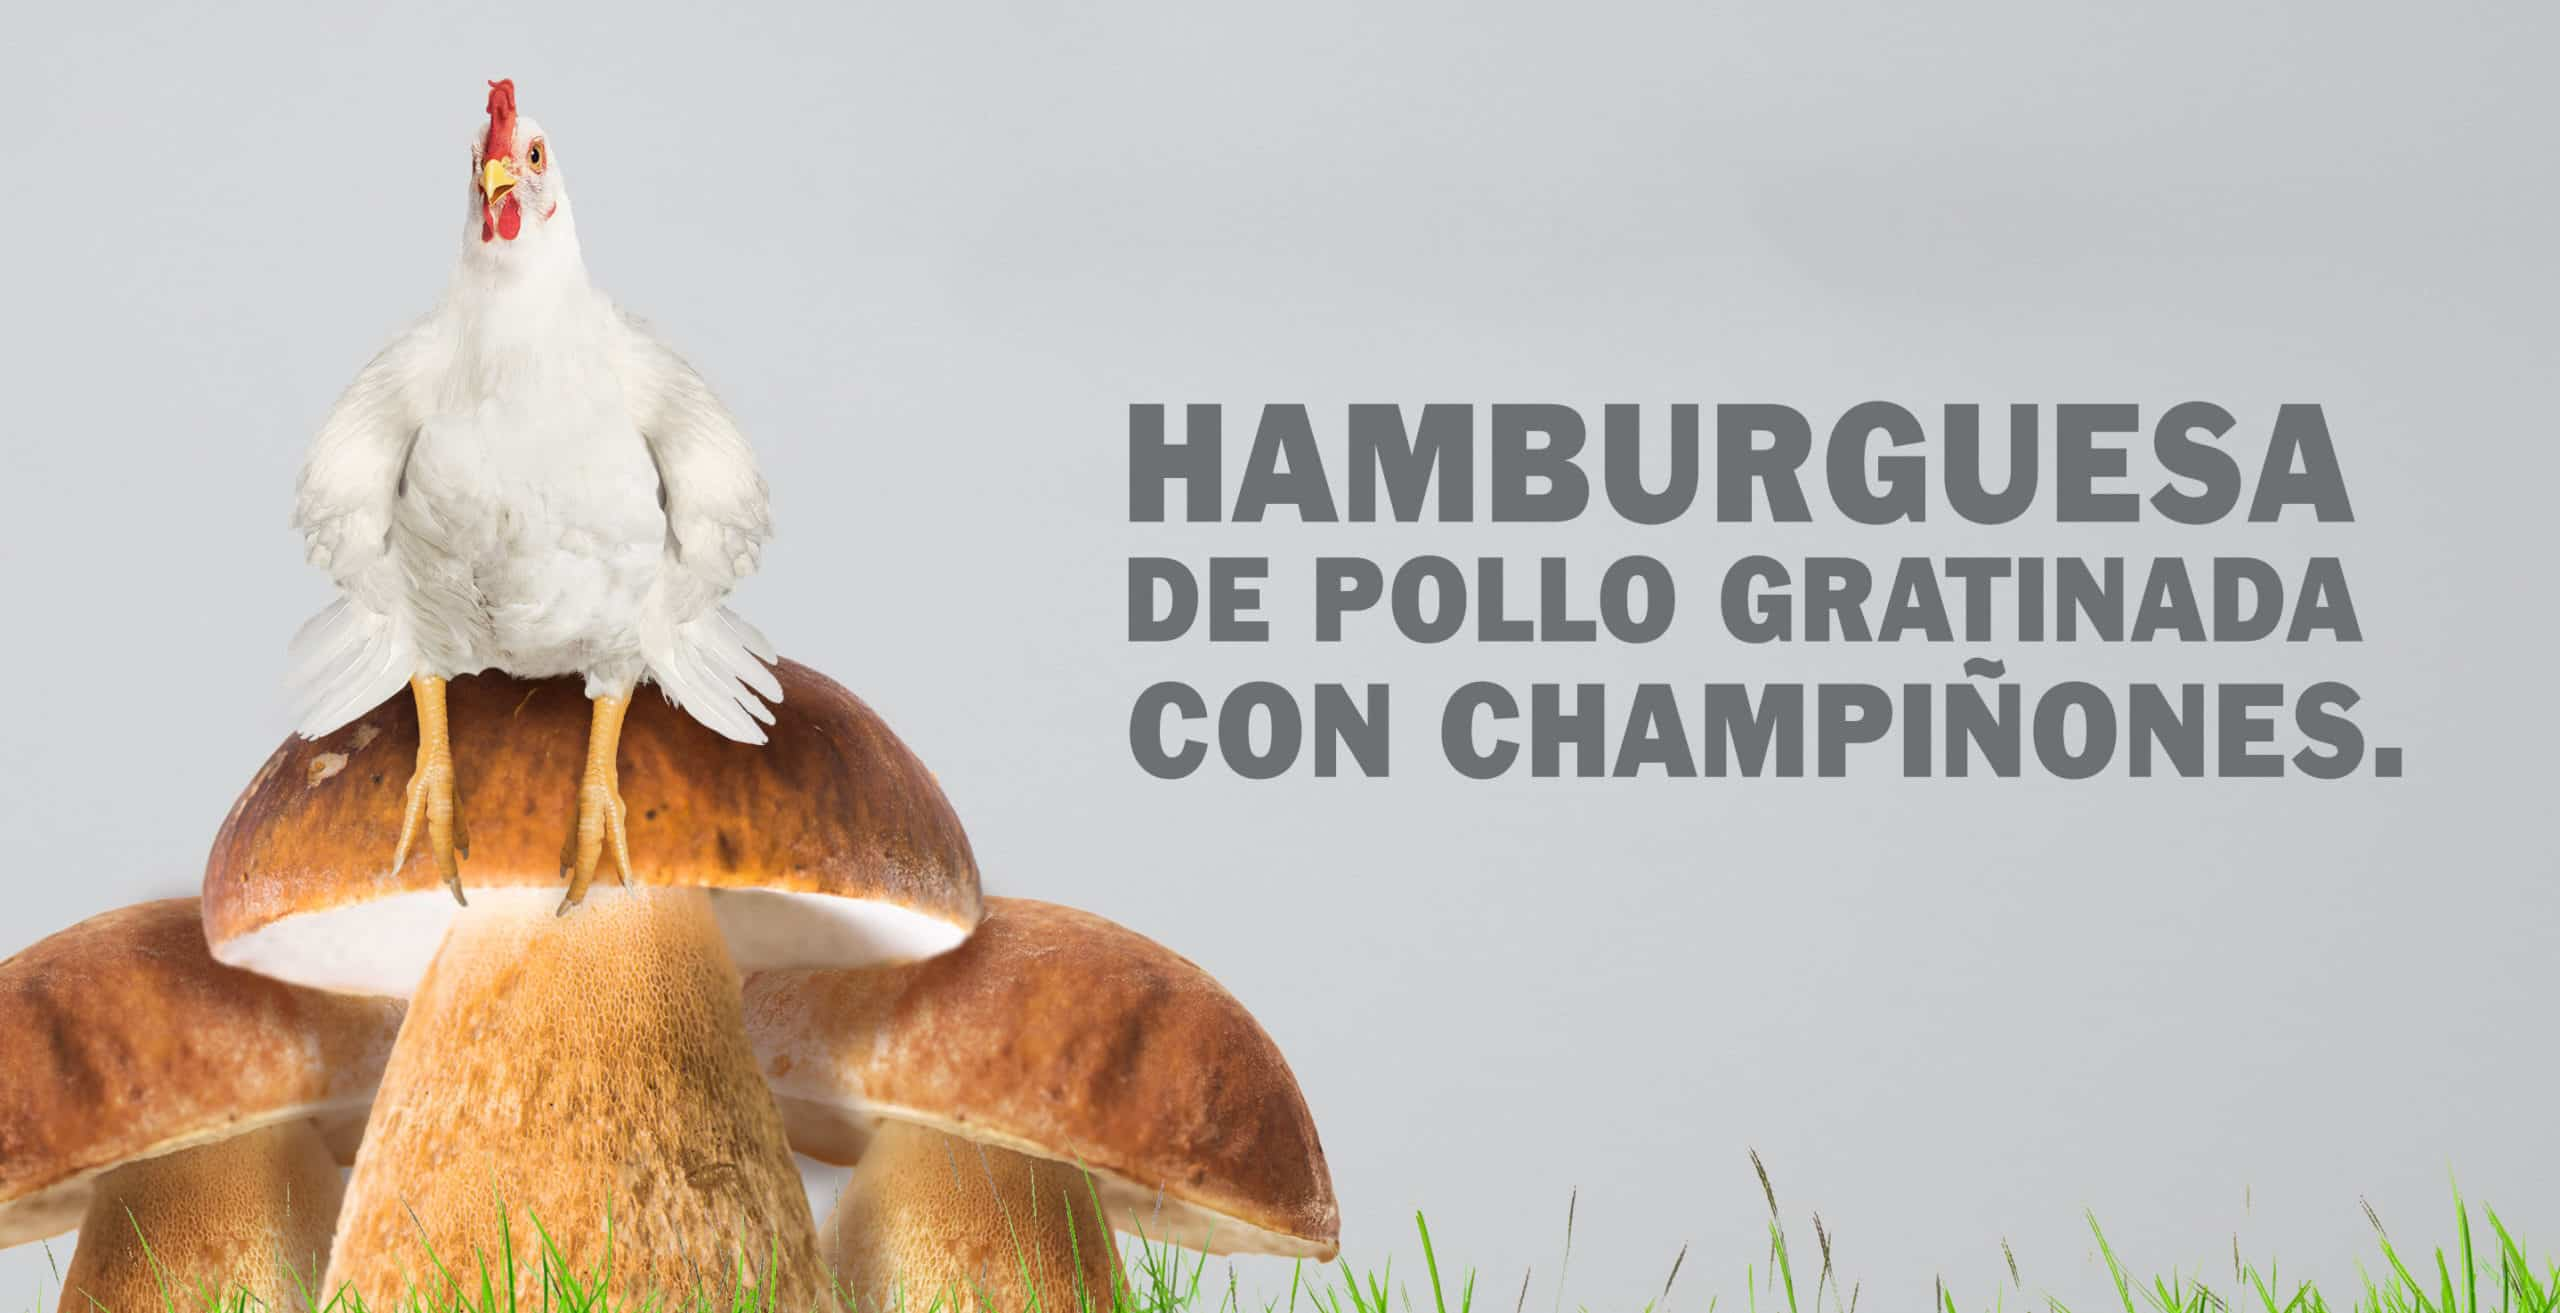 Hamburguesa_gratinada_con_champiñones